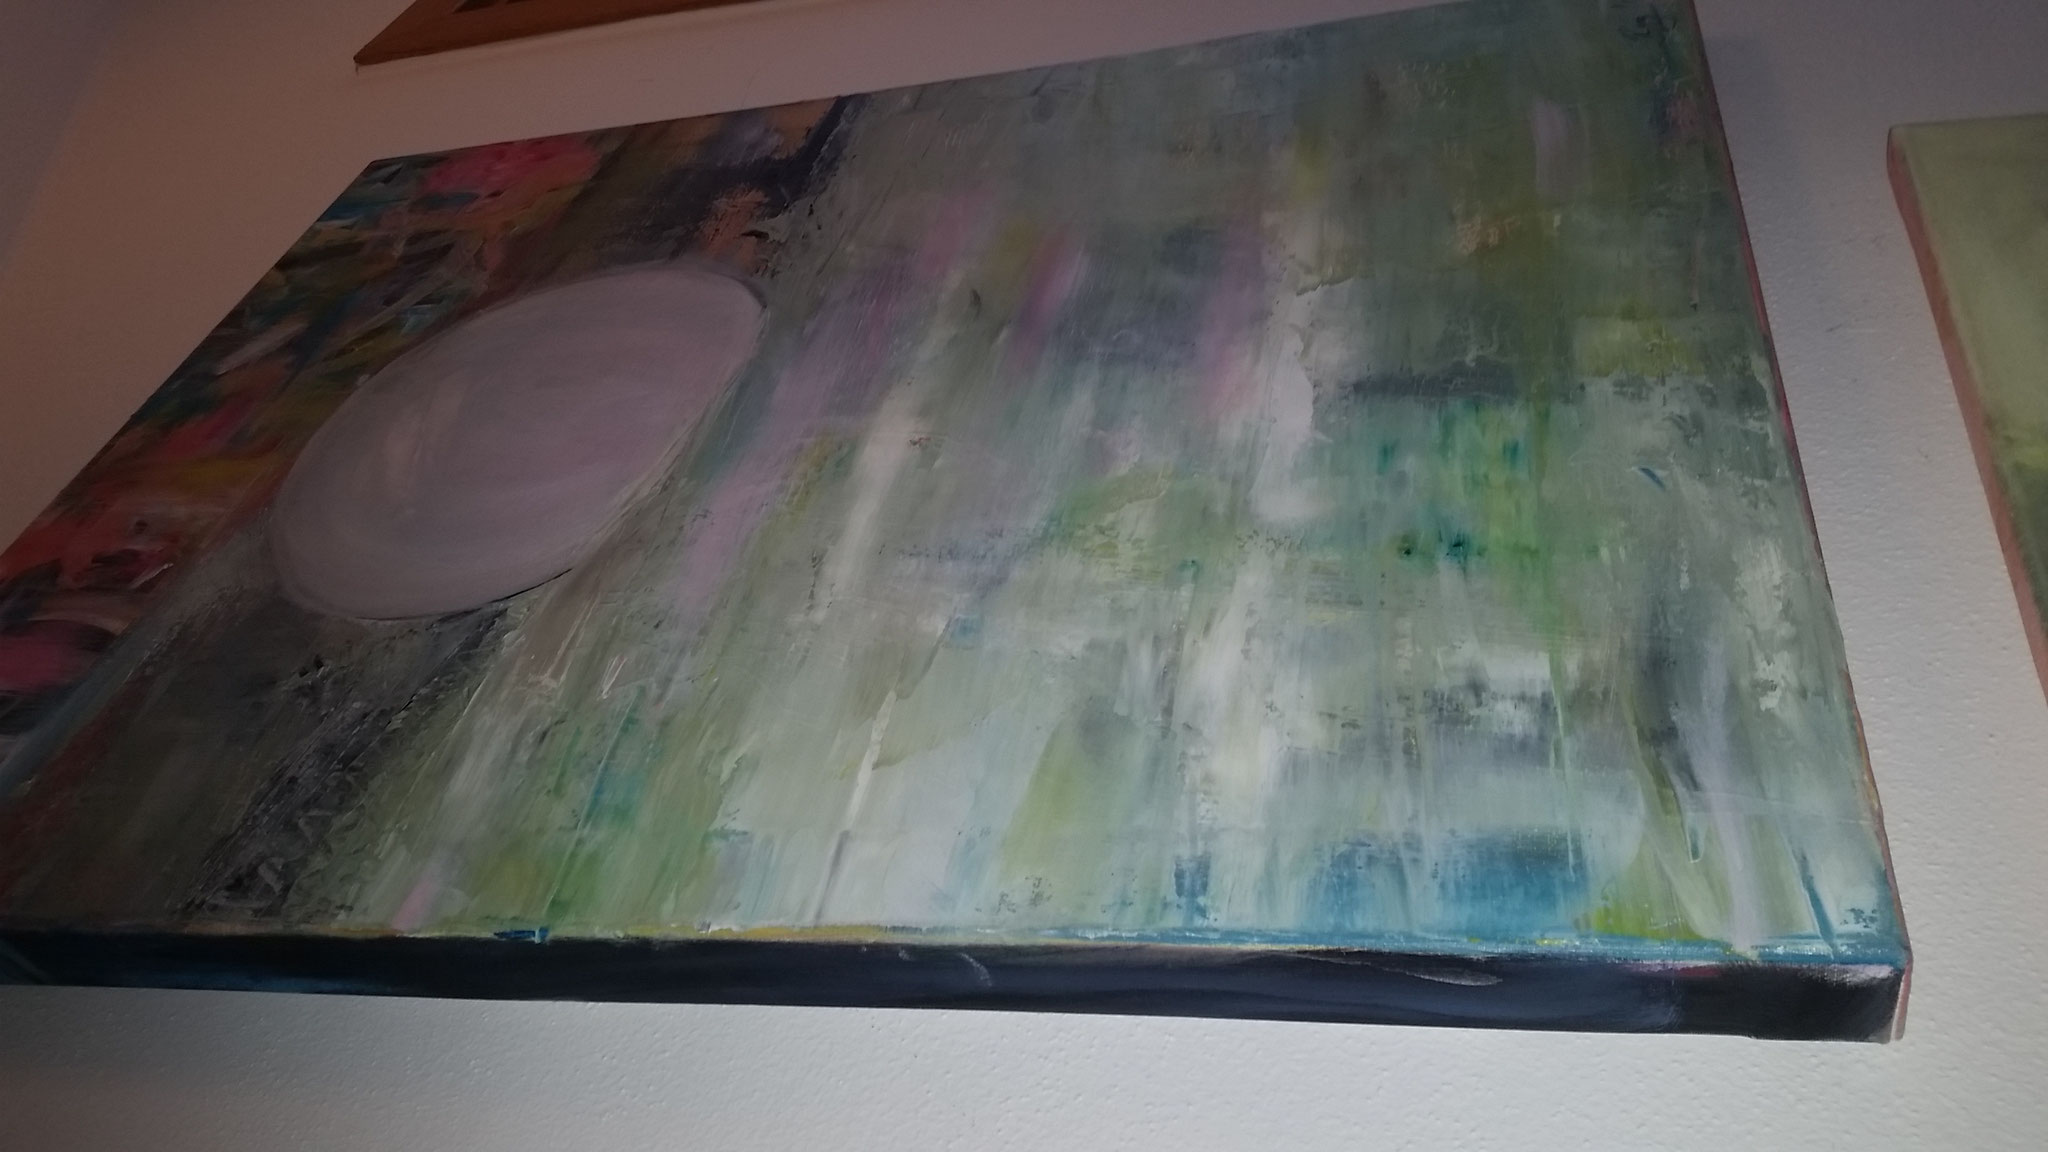 Treppen-Galerie 22, Maler Künstlerin Bozana